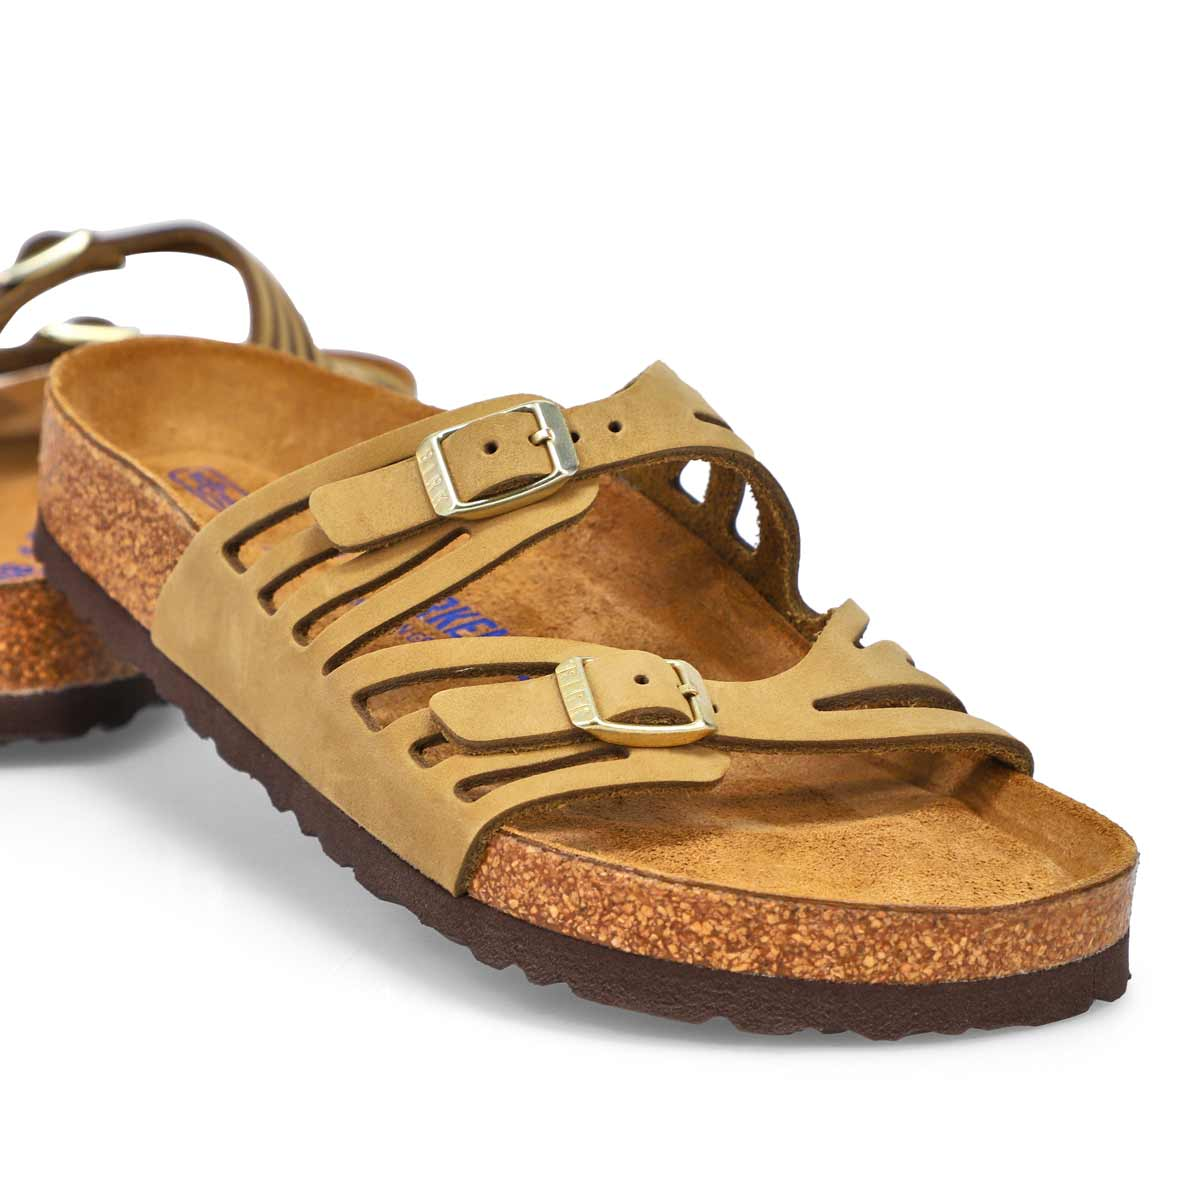 Sandale GRANADA SF kaki femmes